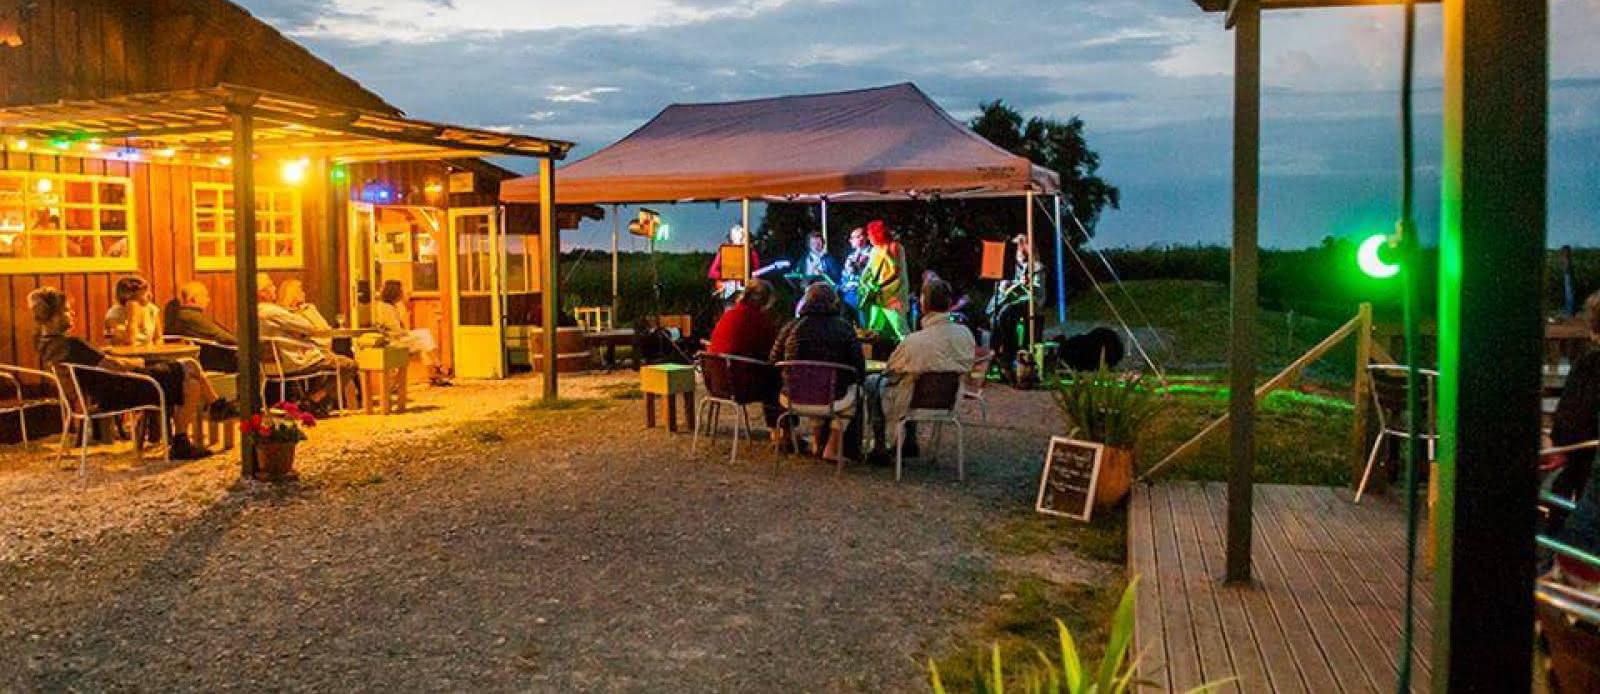 Le-Kayak-Cafe2-2